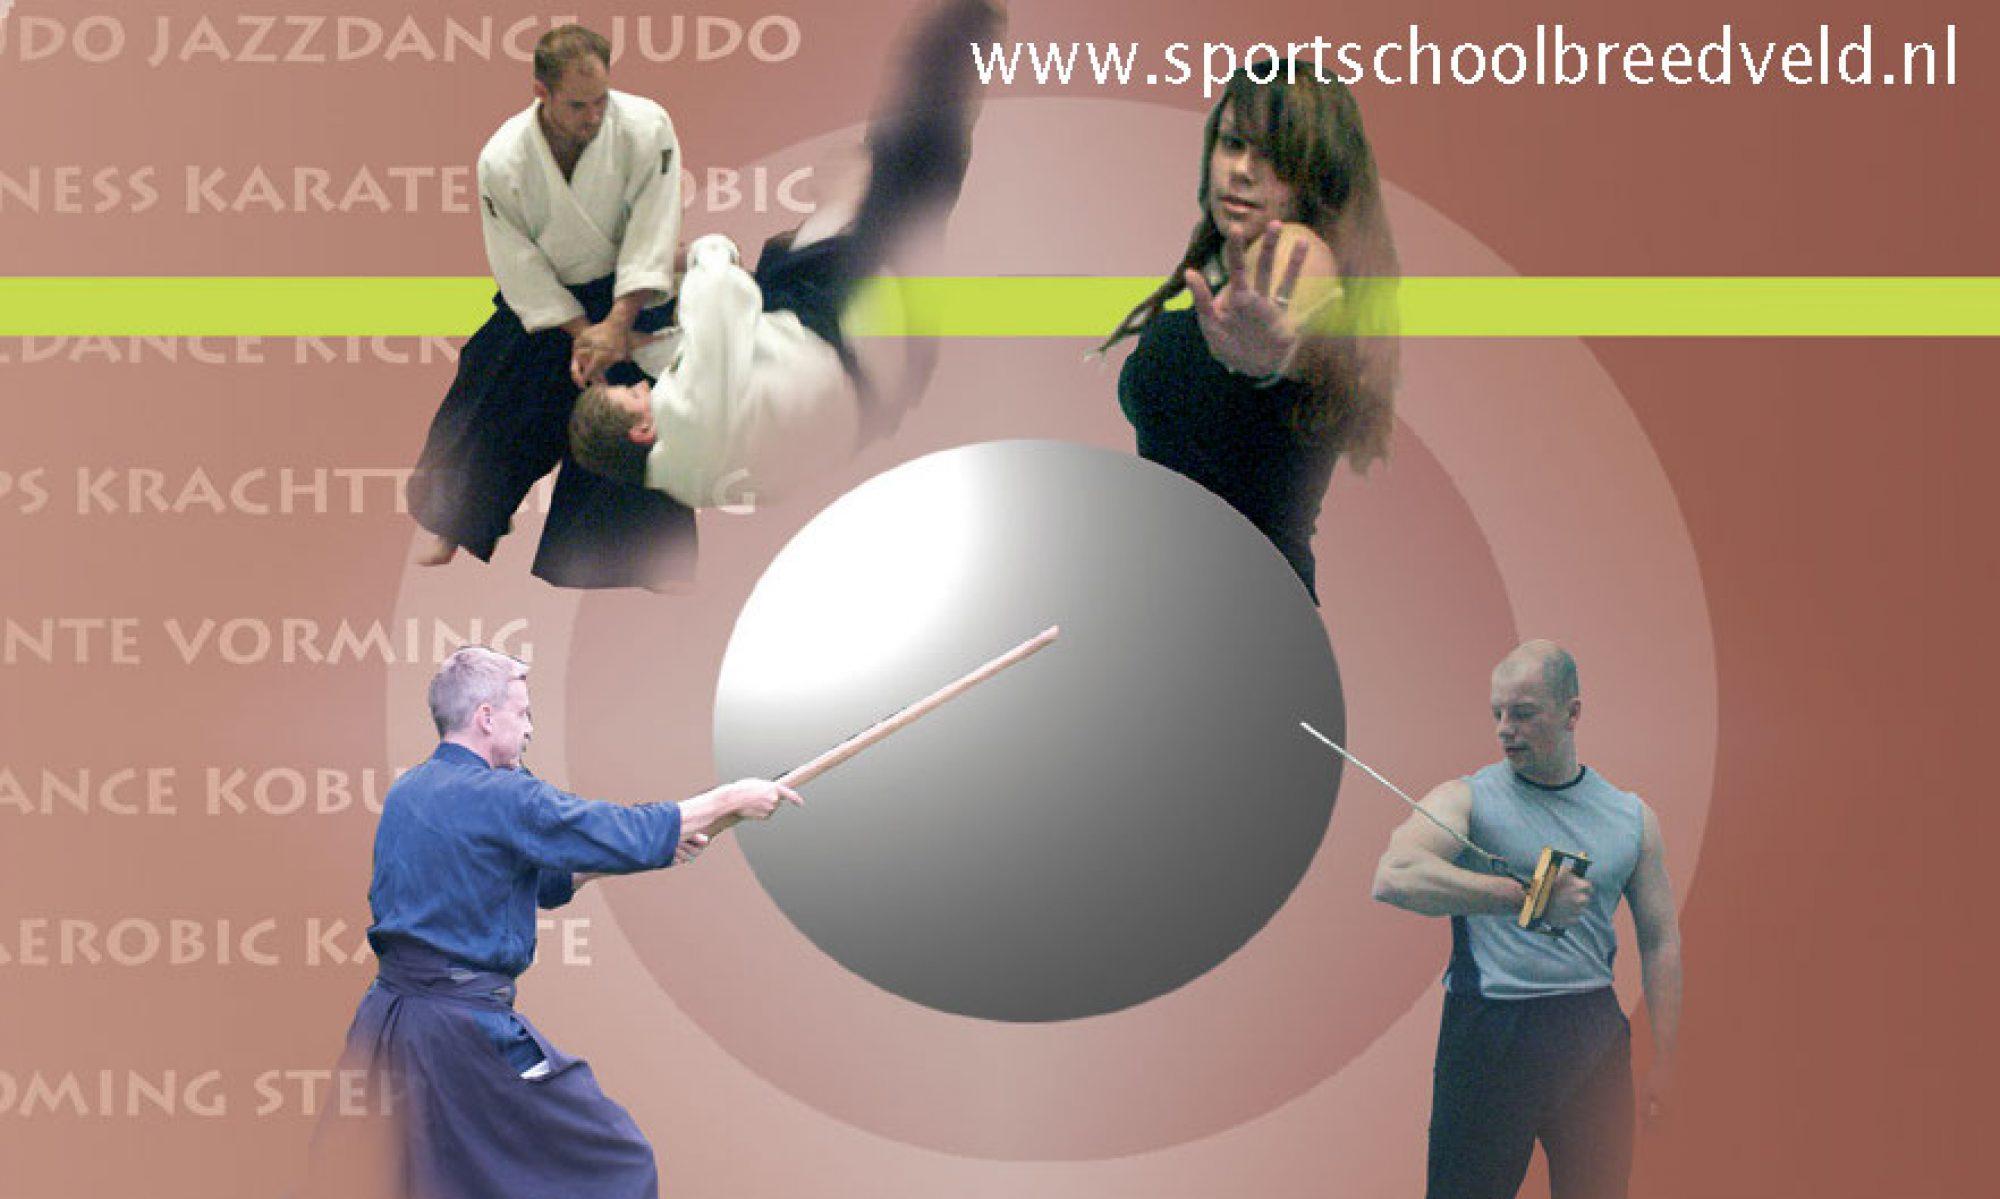 Sportschool Breedveld